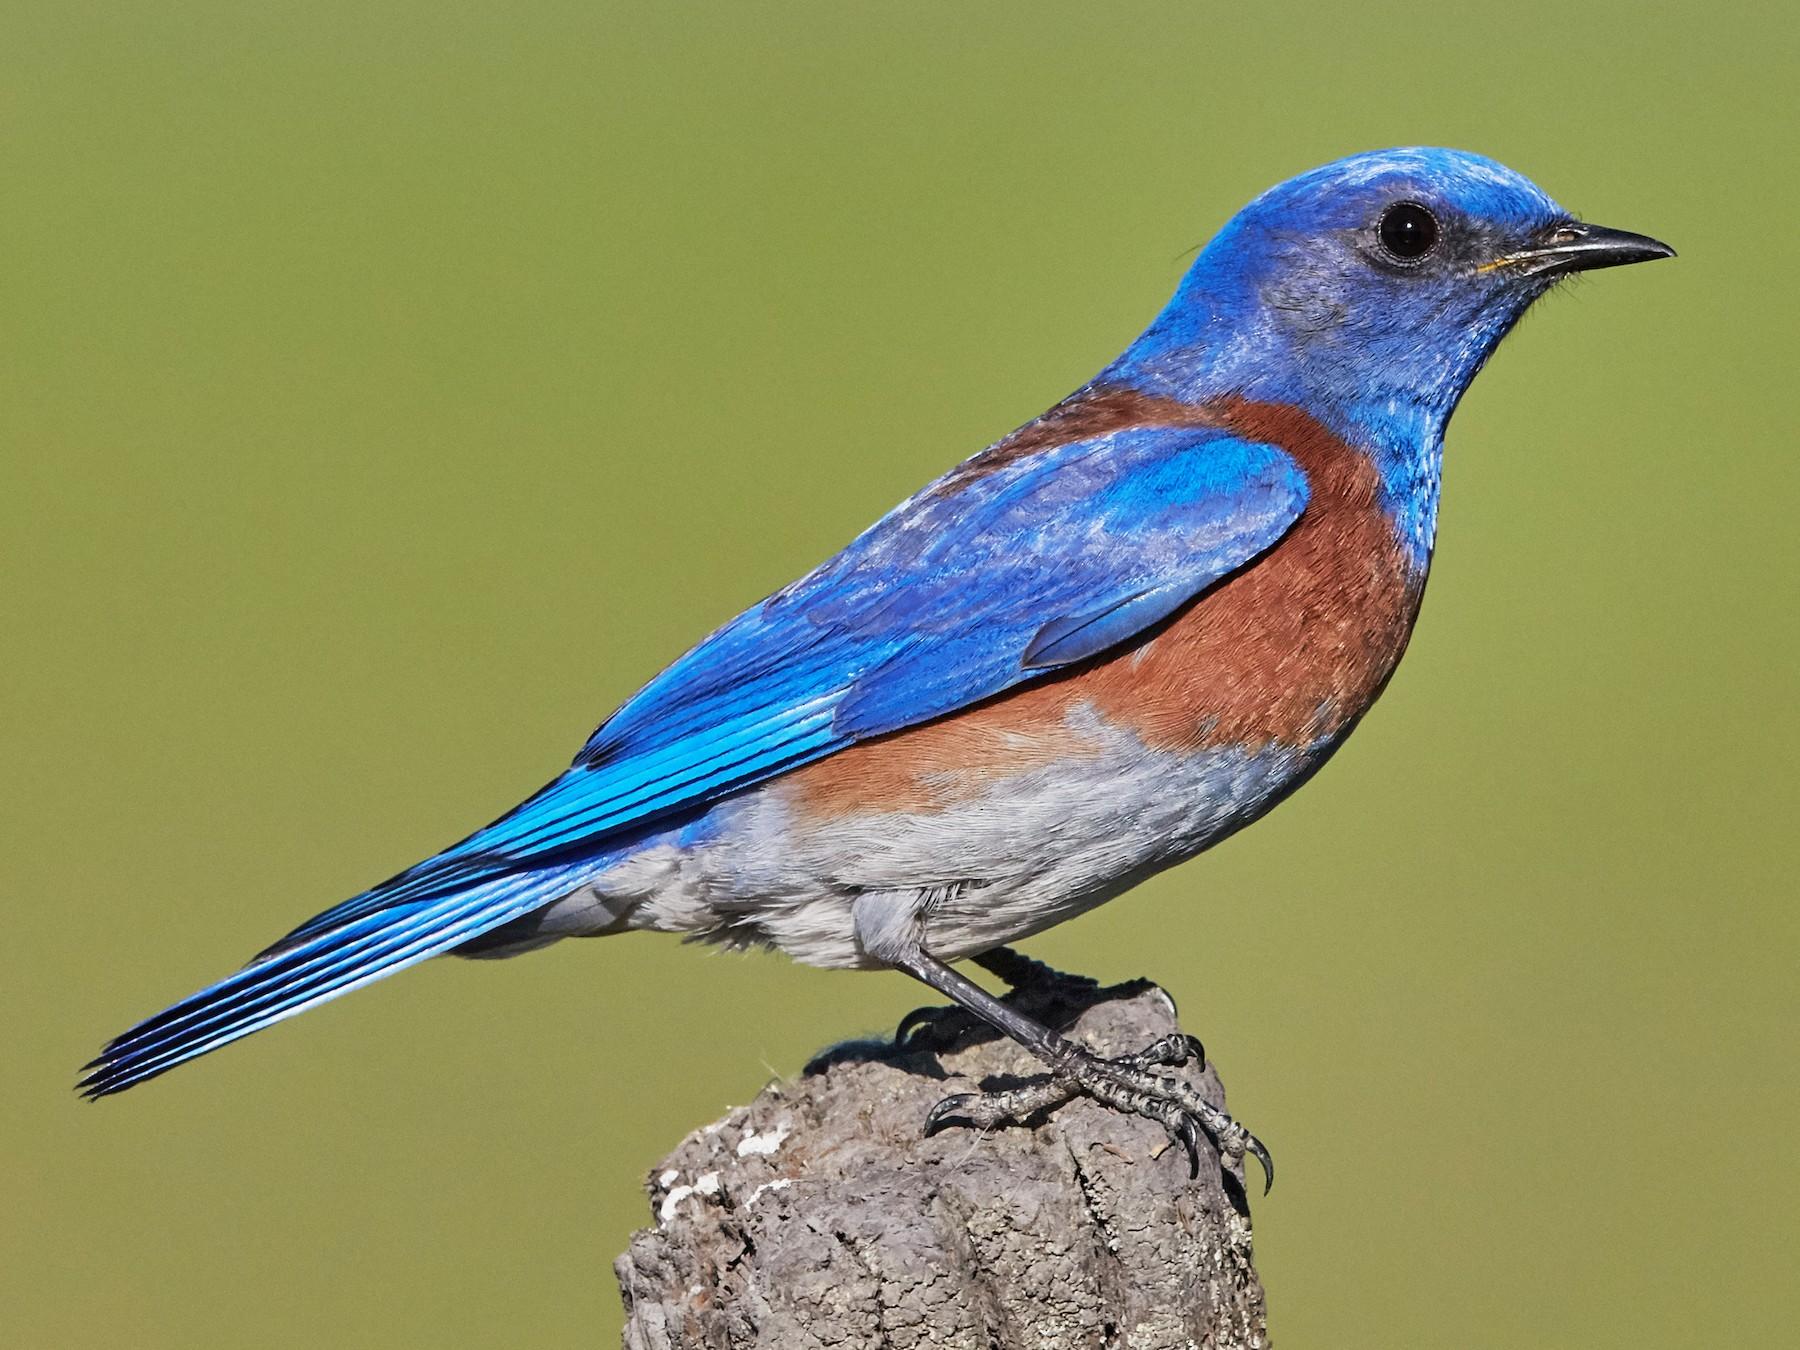 Western Bluebird - Brooke Miller